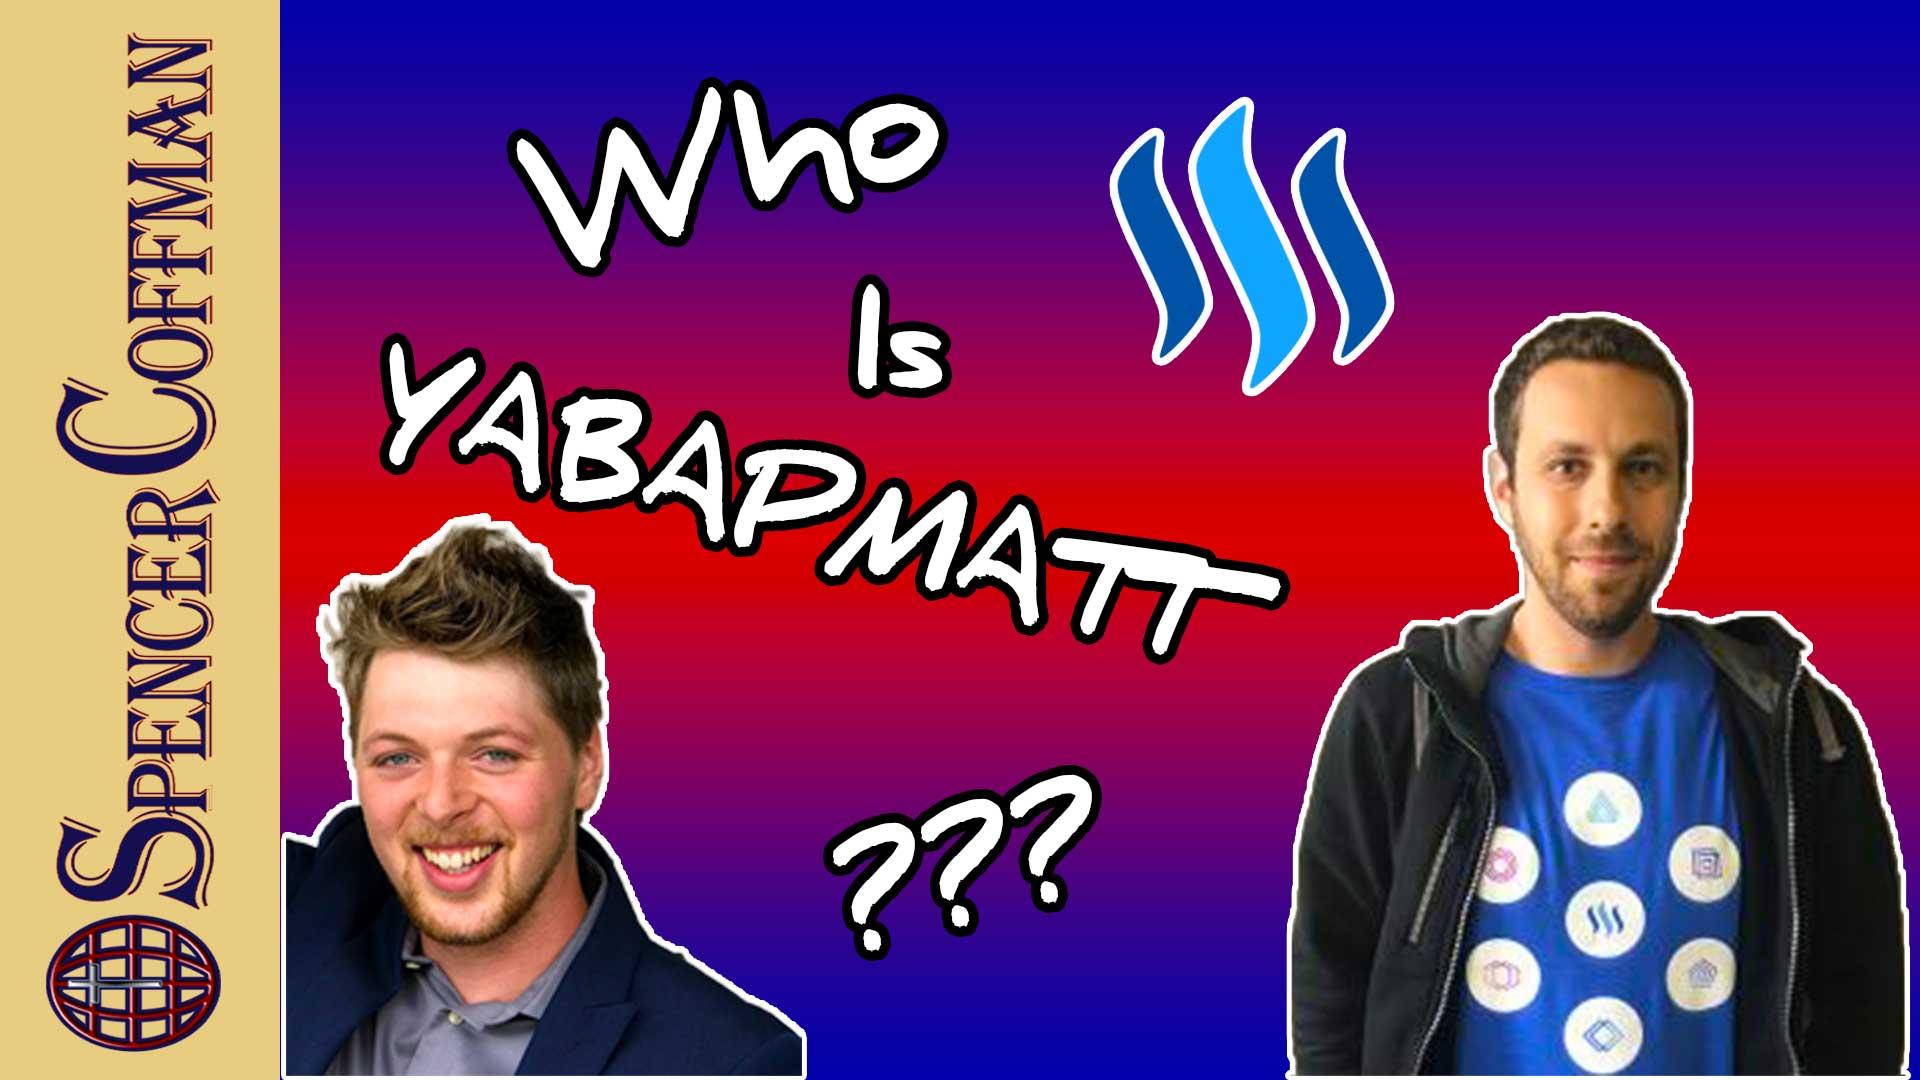 Who Is Yabapmatt - Steemit Wittness Interview